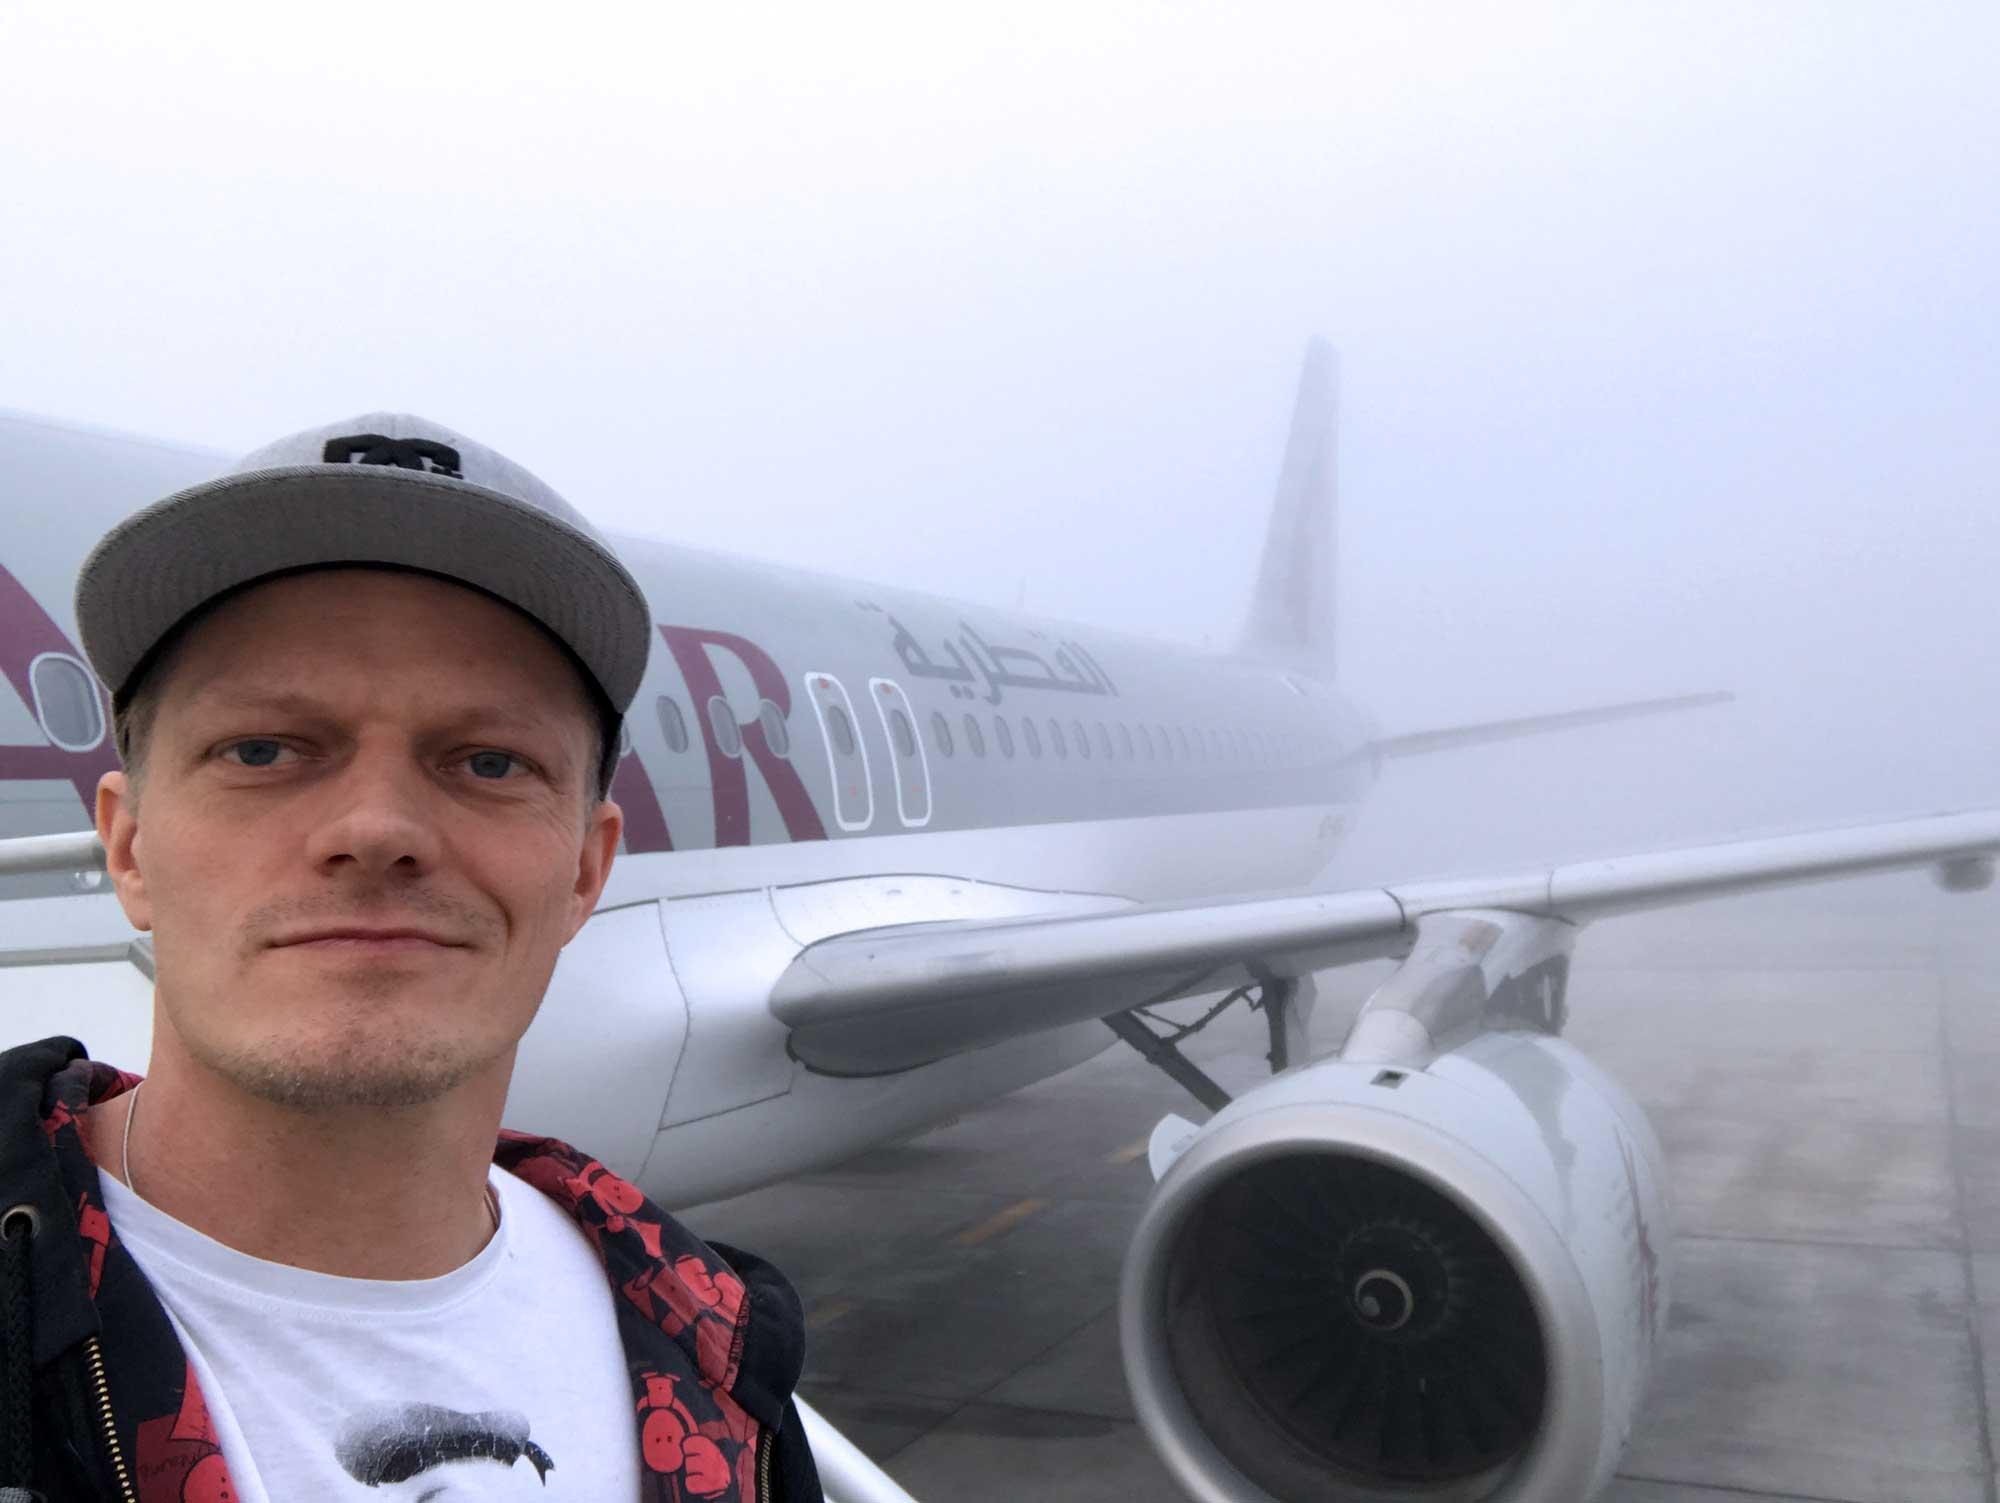 Qatar Airways QR308 Helsinki to Doha - Travel - Blog - Screw Them All